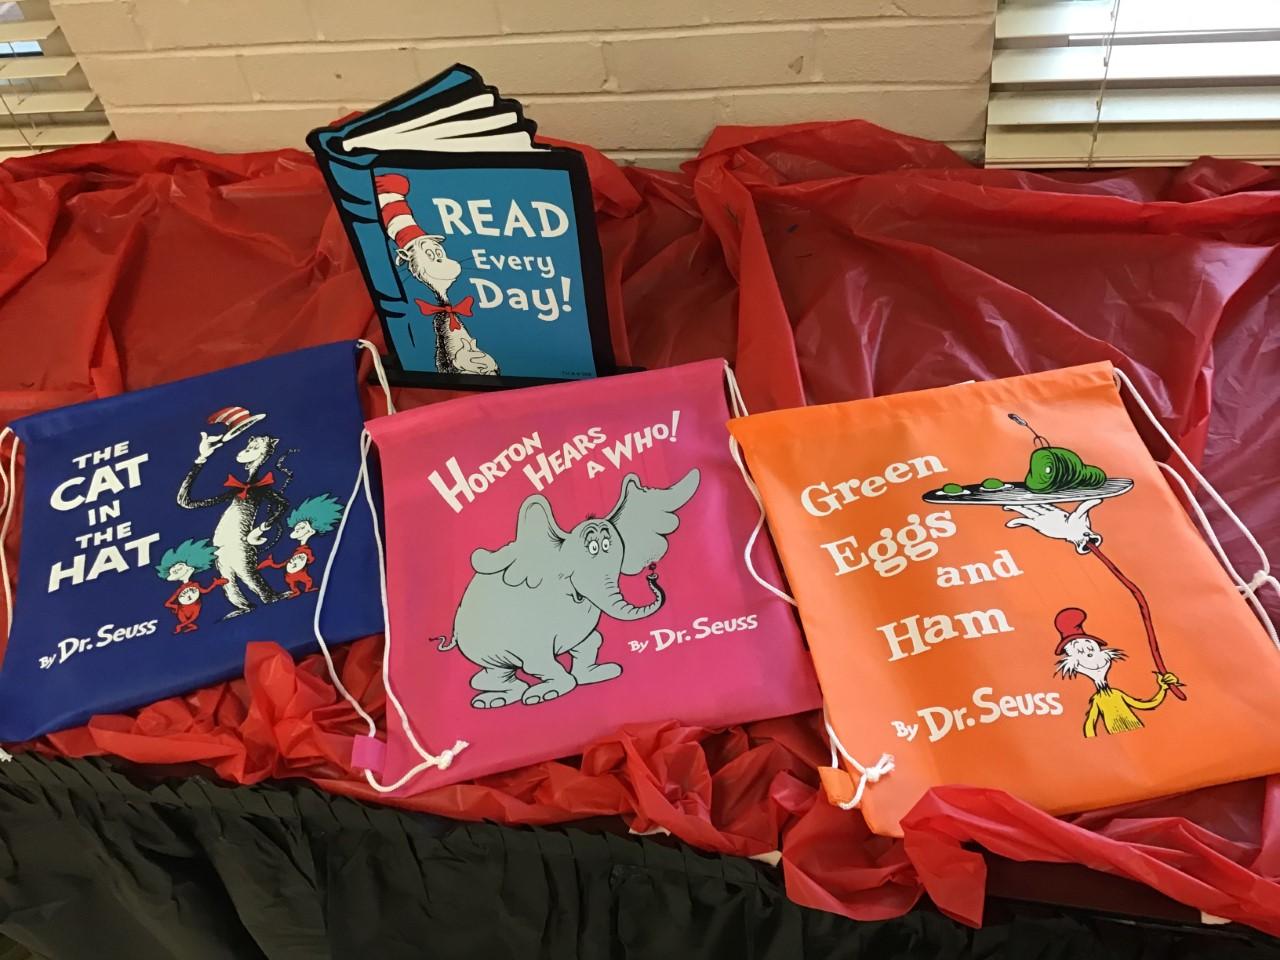 Dr. Seuss bag for students